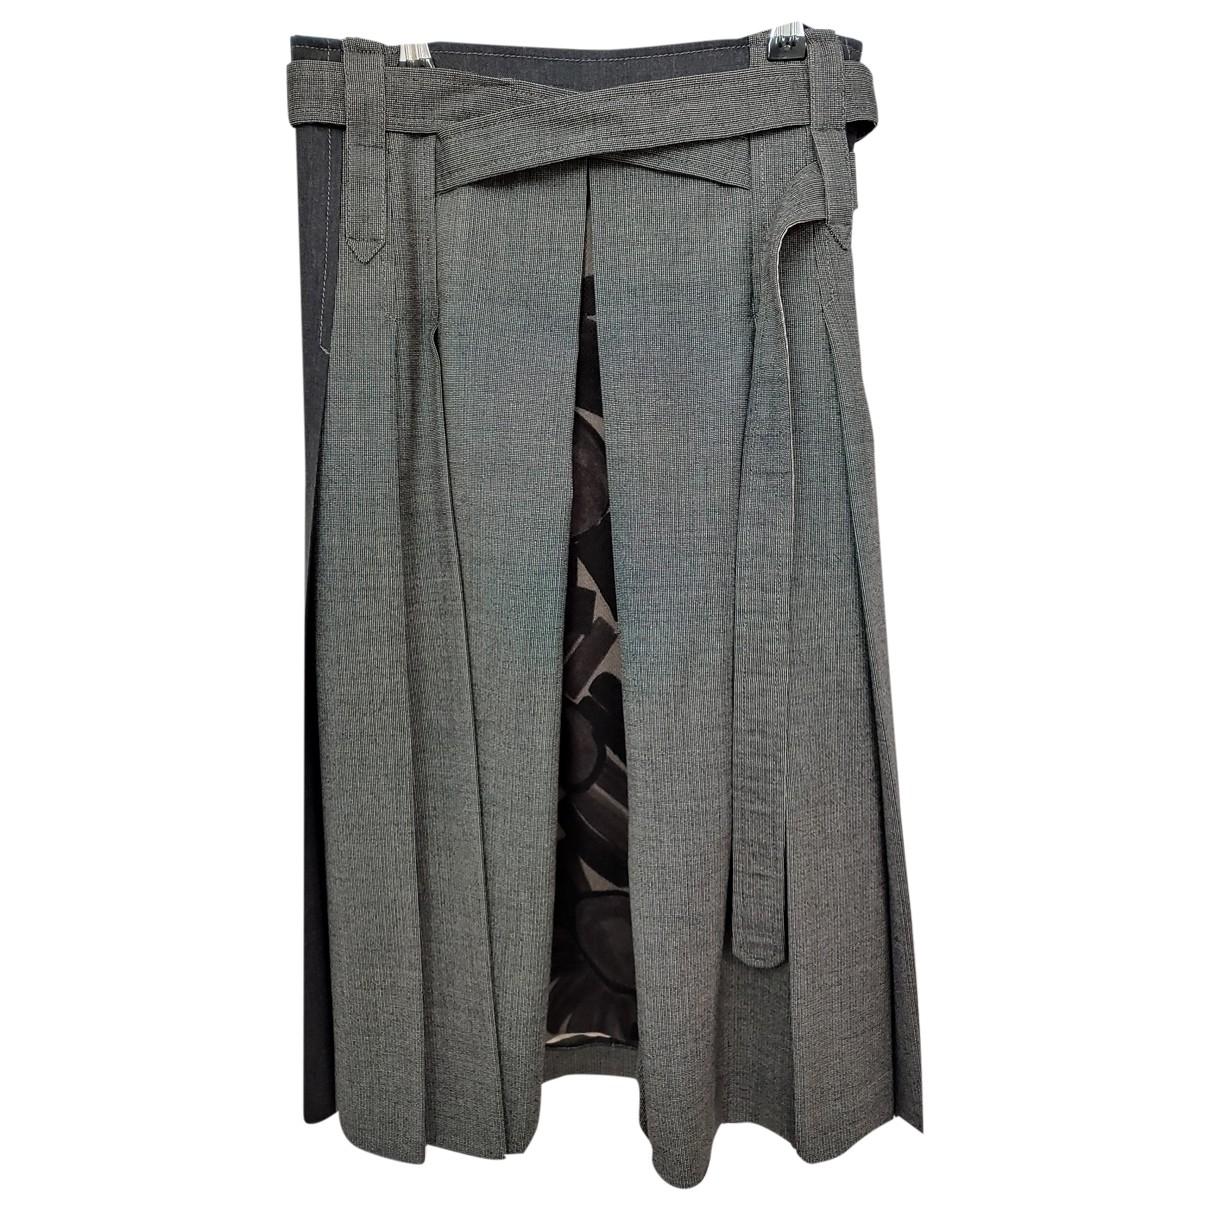 Kenzo \N Grey Wool skirt for Women 36 FR